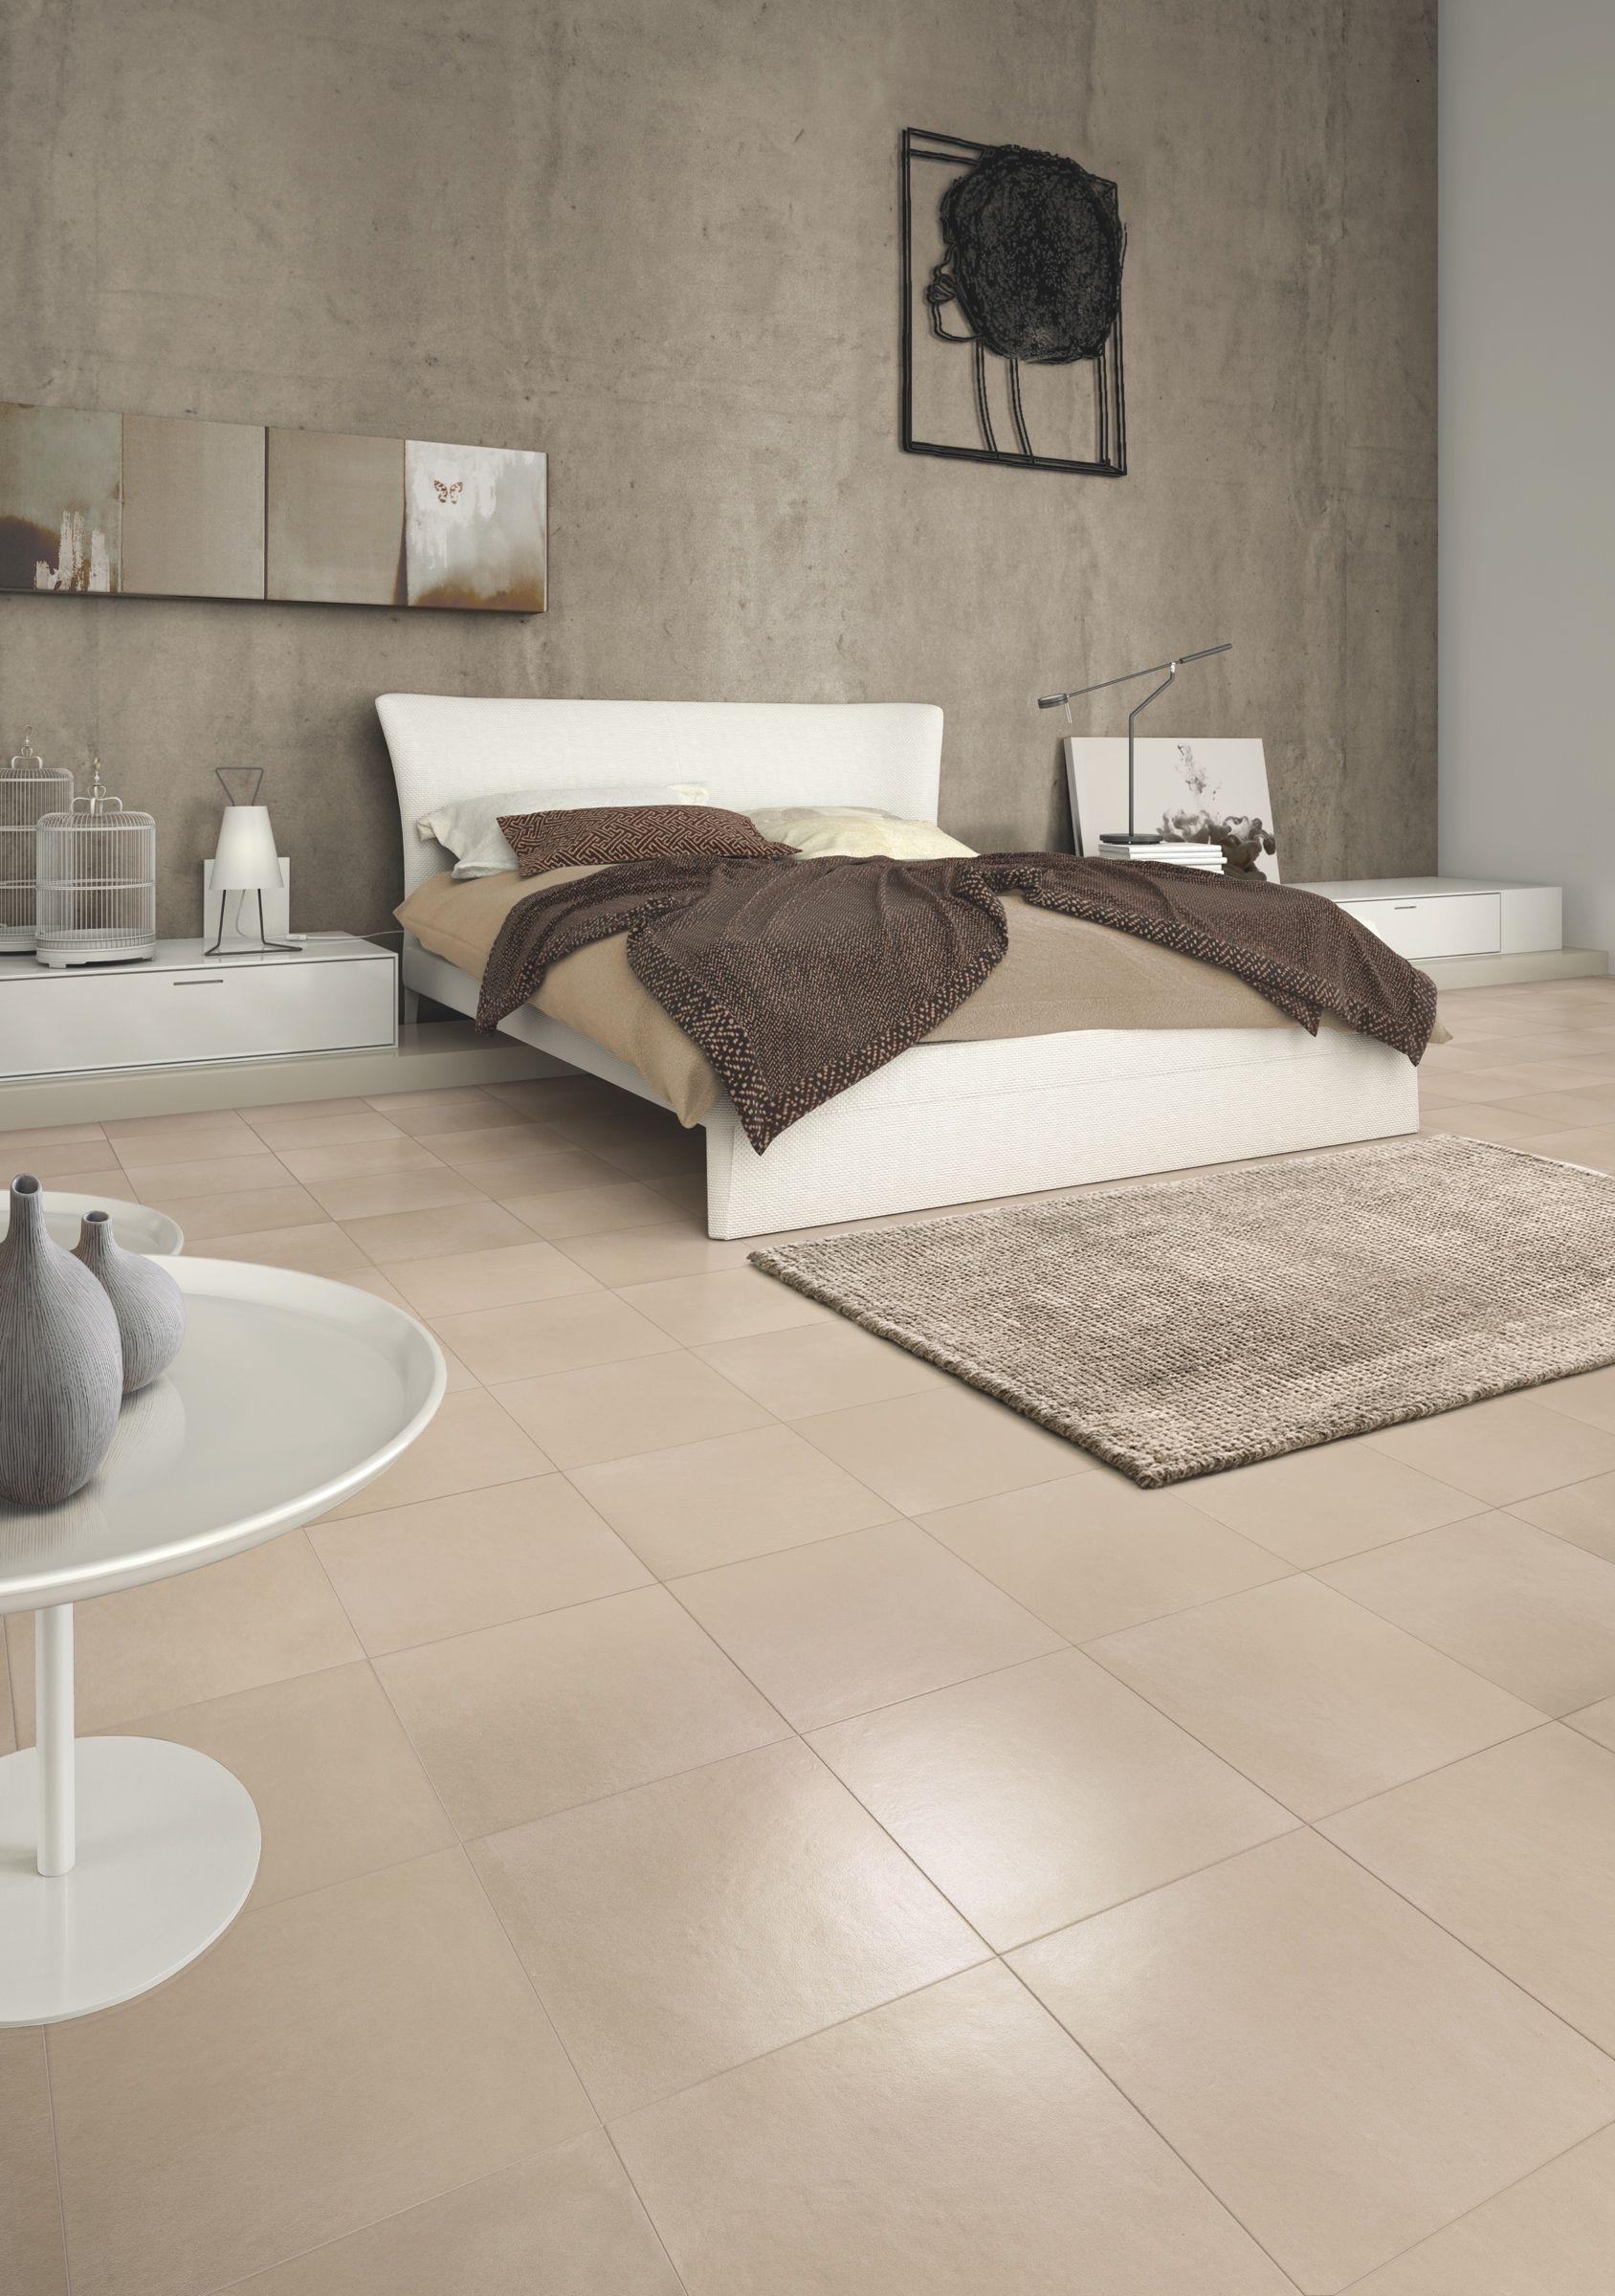 linea ecogres serie feel by casalgrande padana. Black Bedroom Furniture Sets. Home Design Ideas